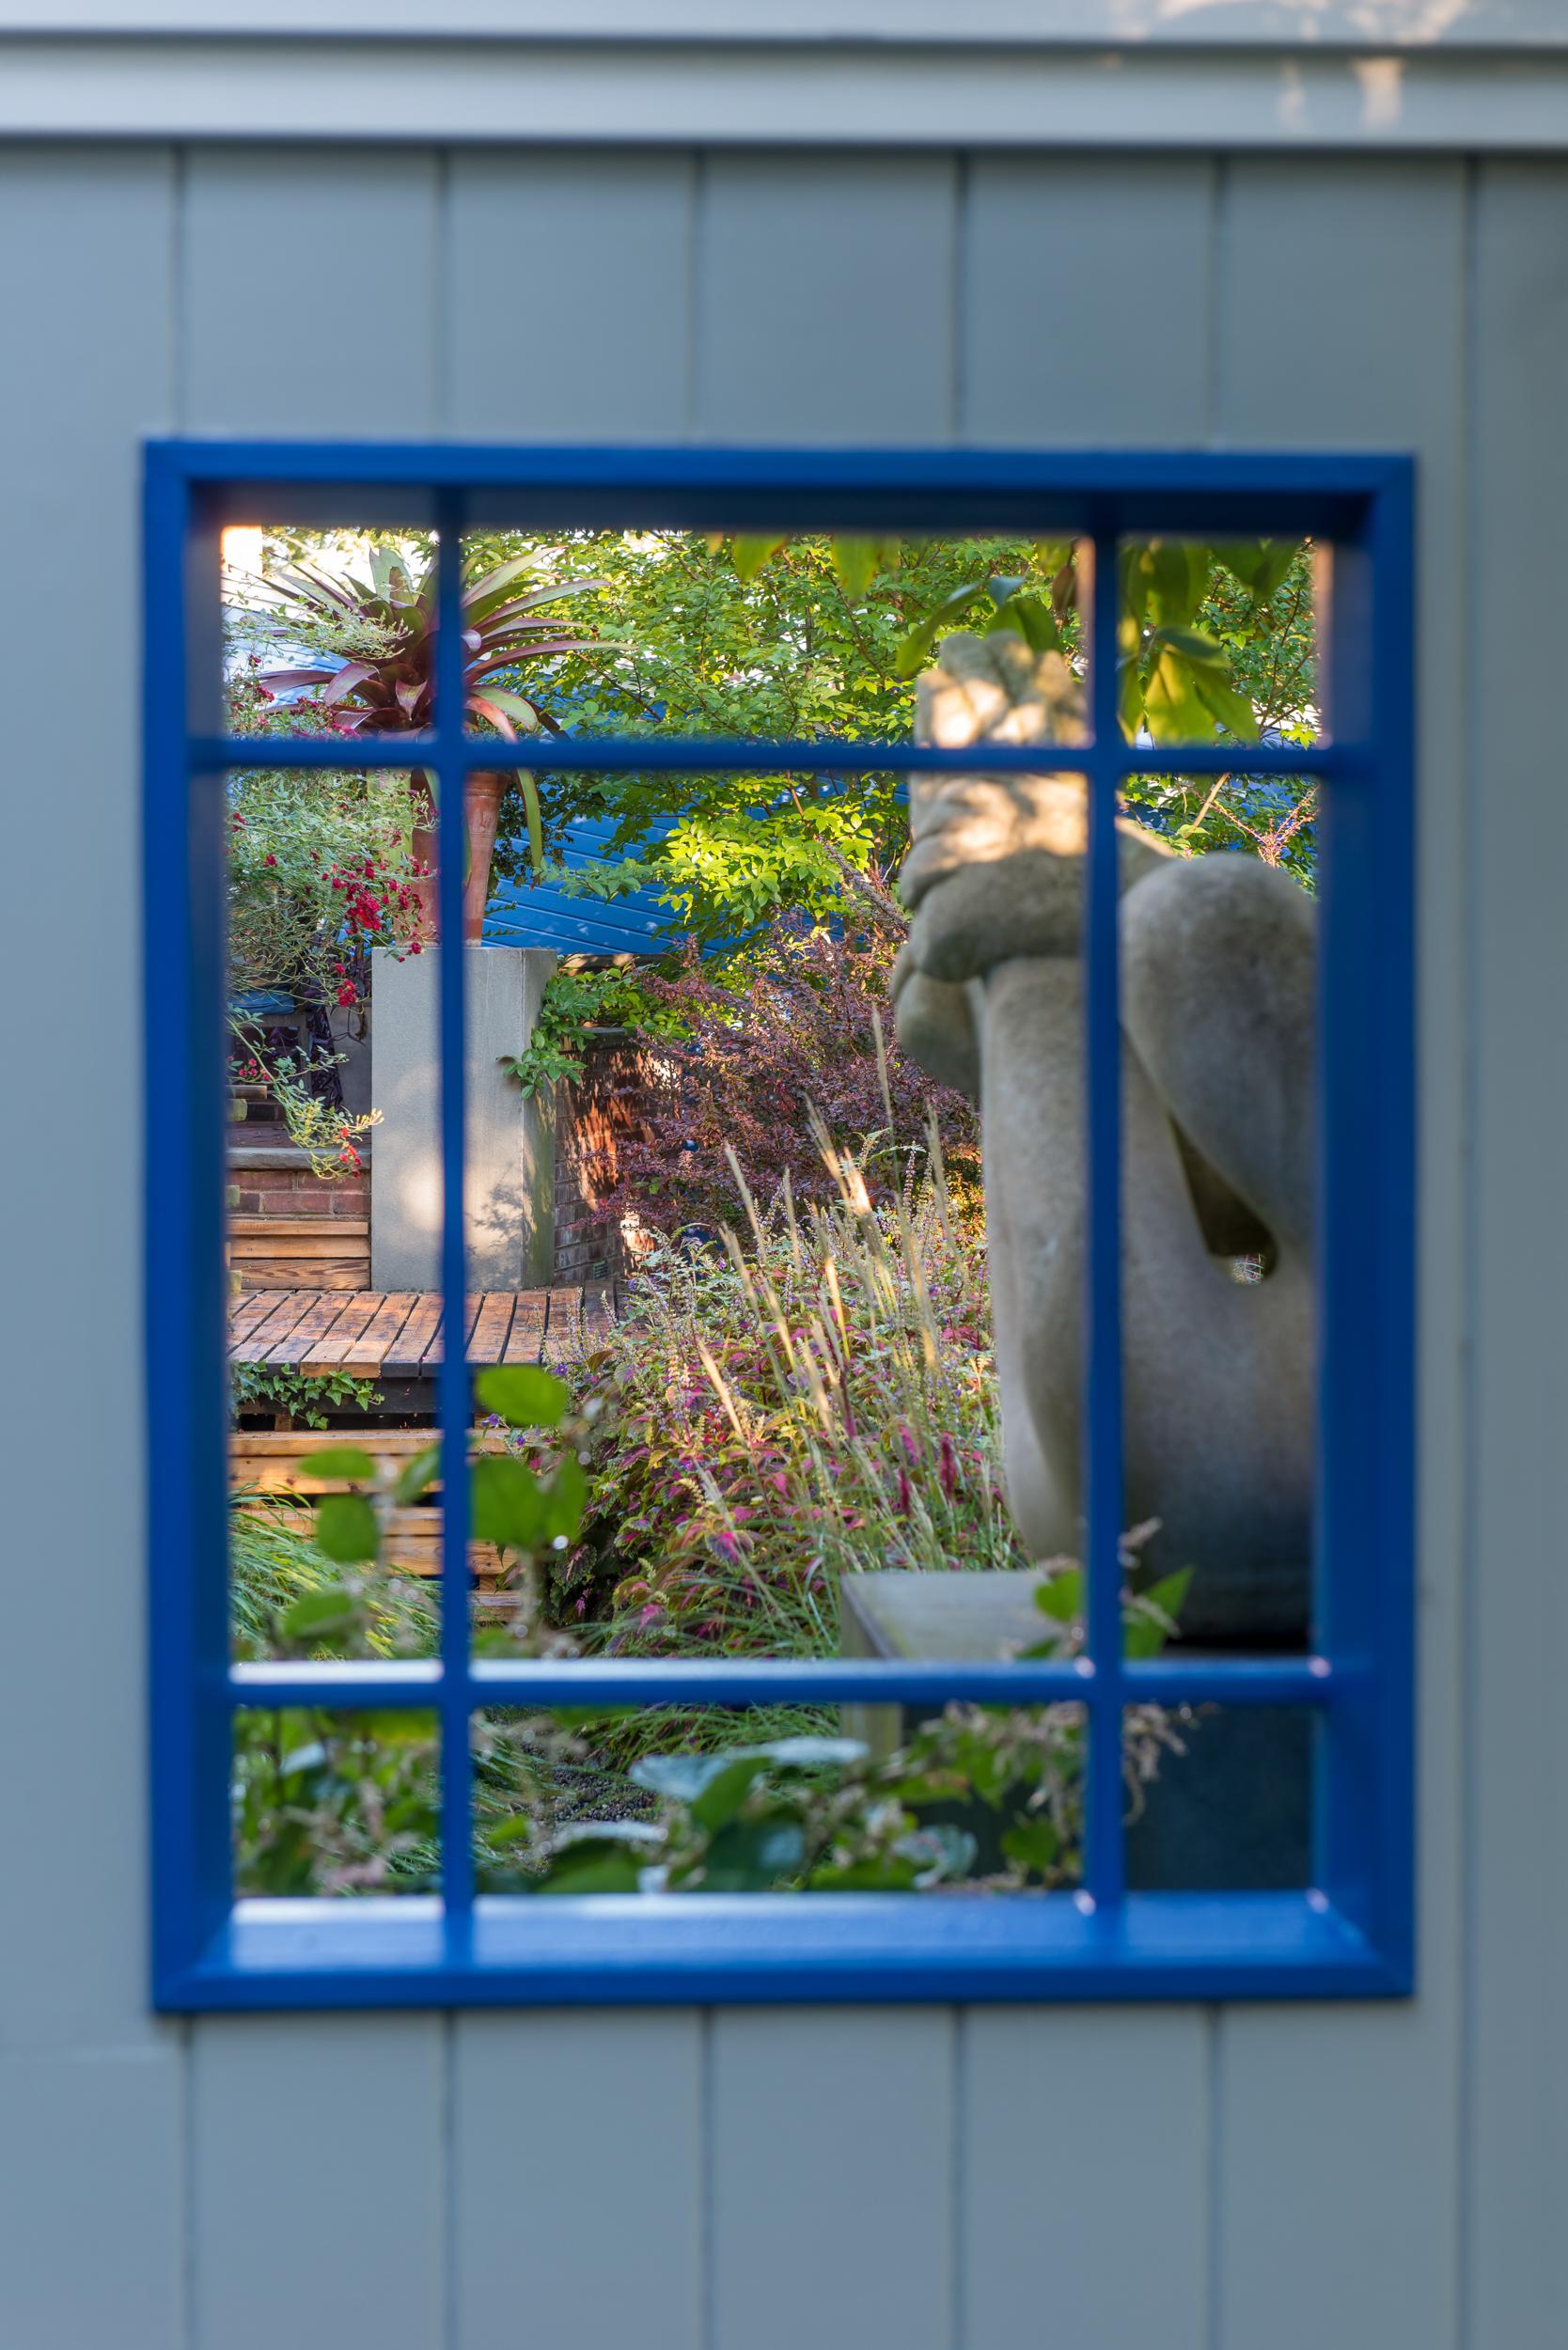 Mirror reflecting a small footprint garden